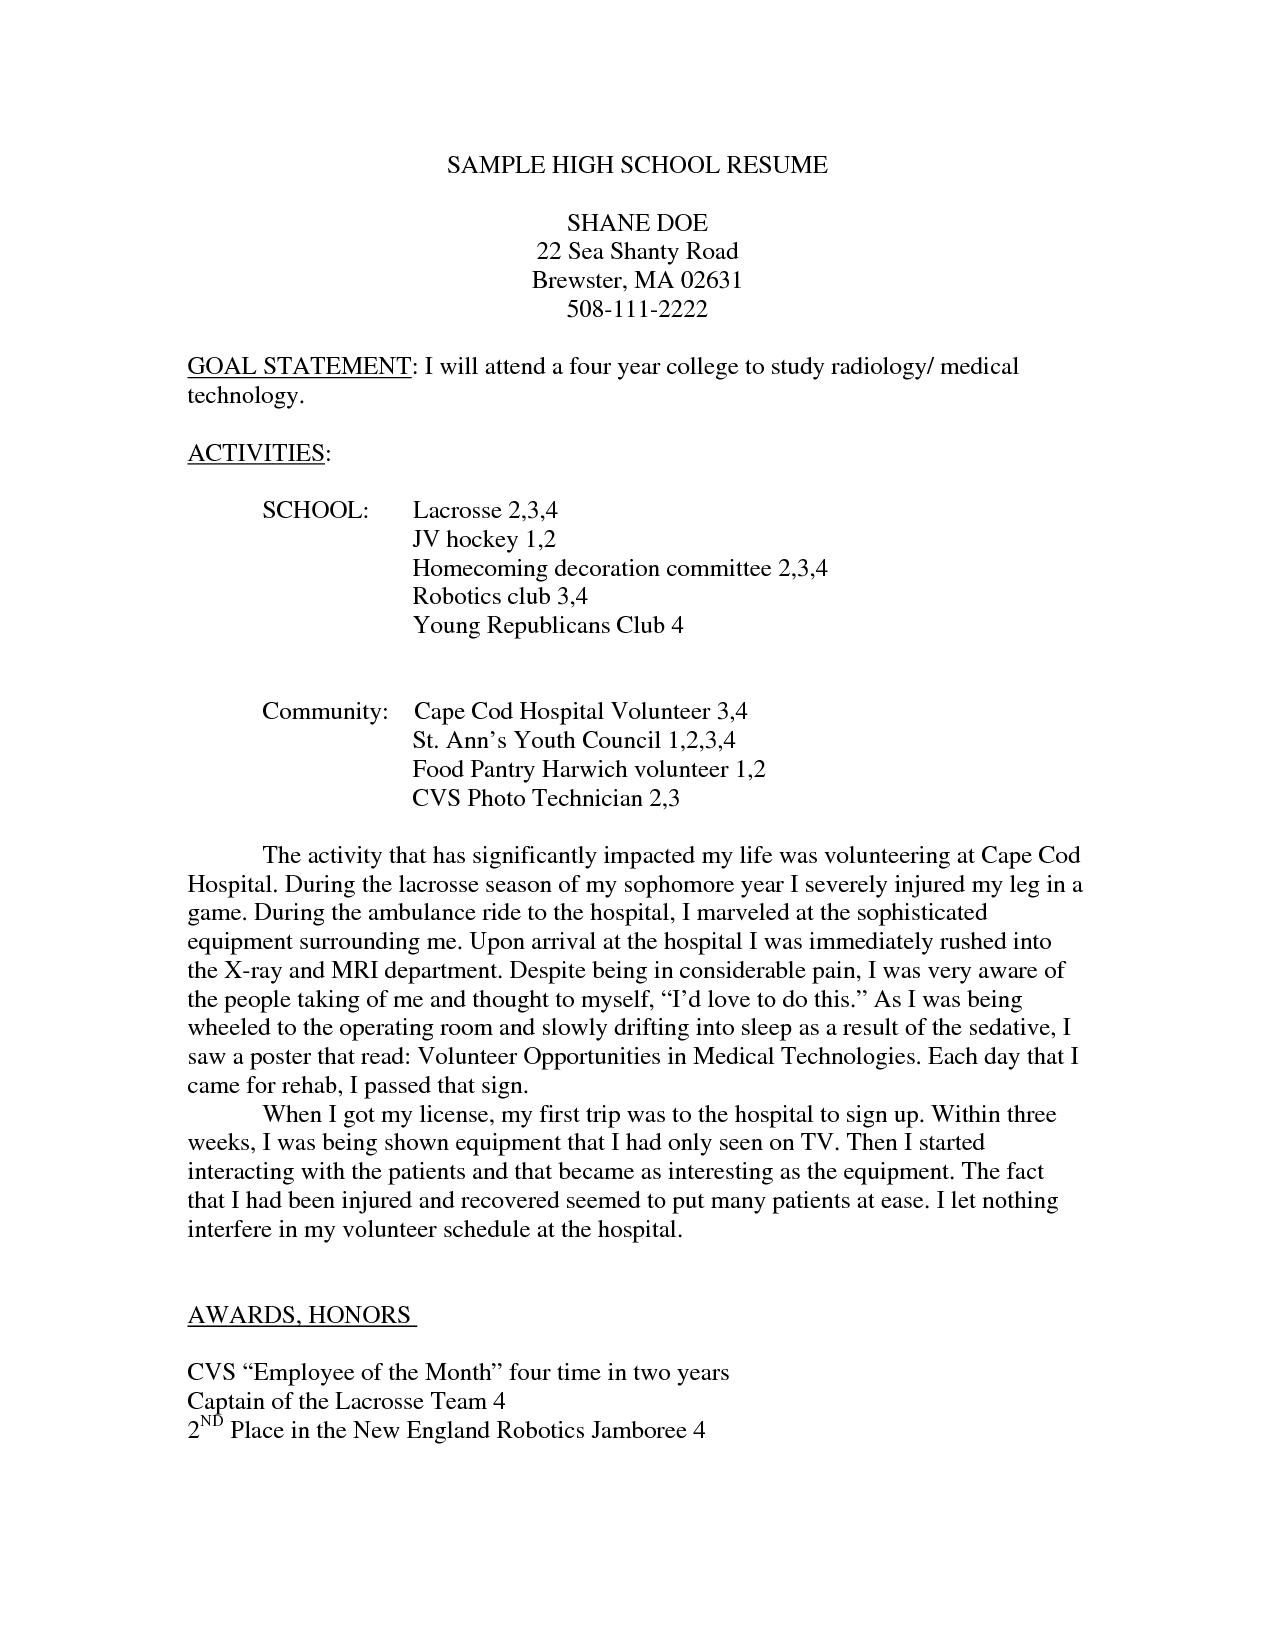 High School Resume Templates 2015 - Http://www.jobresume.website/high-School -Resume-Templates-2015-17/